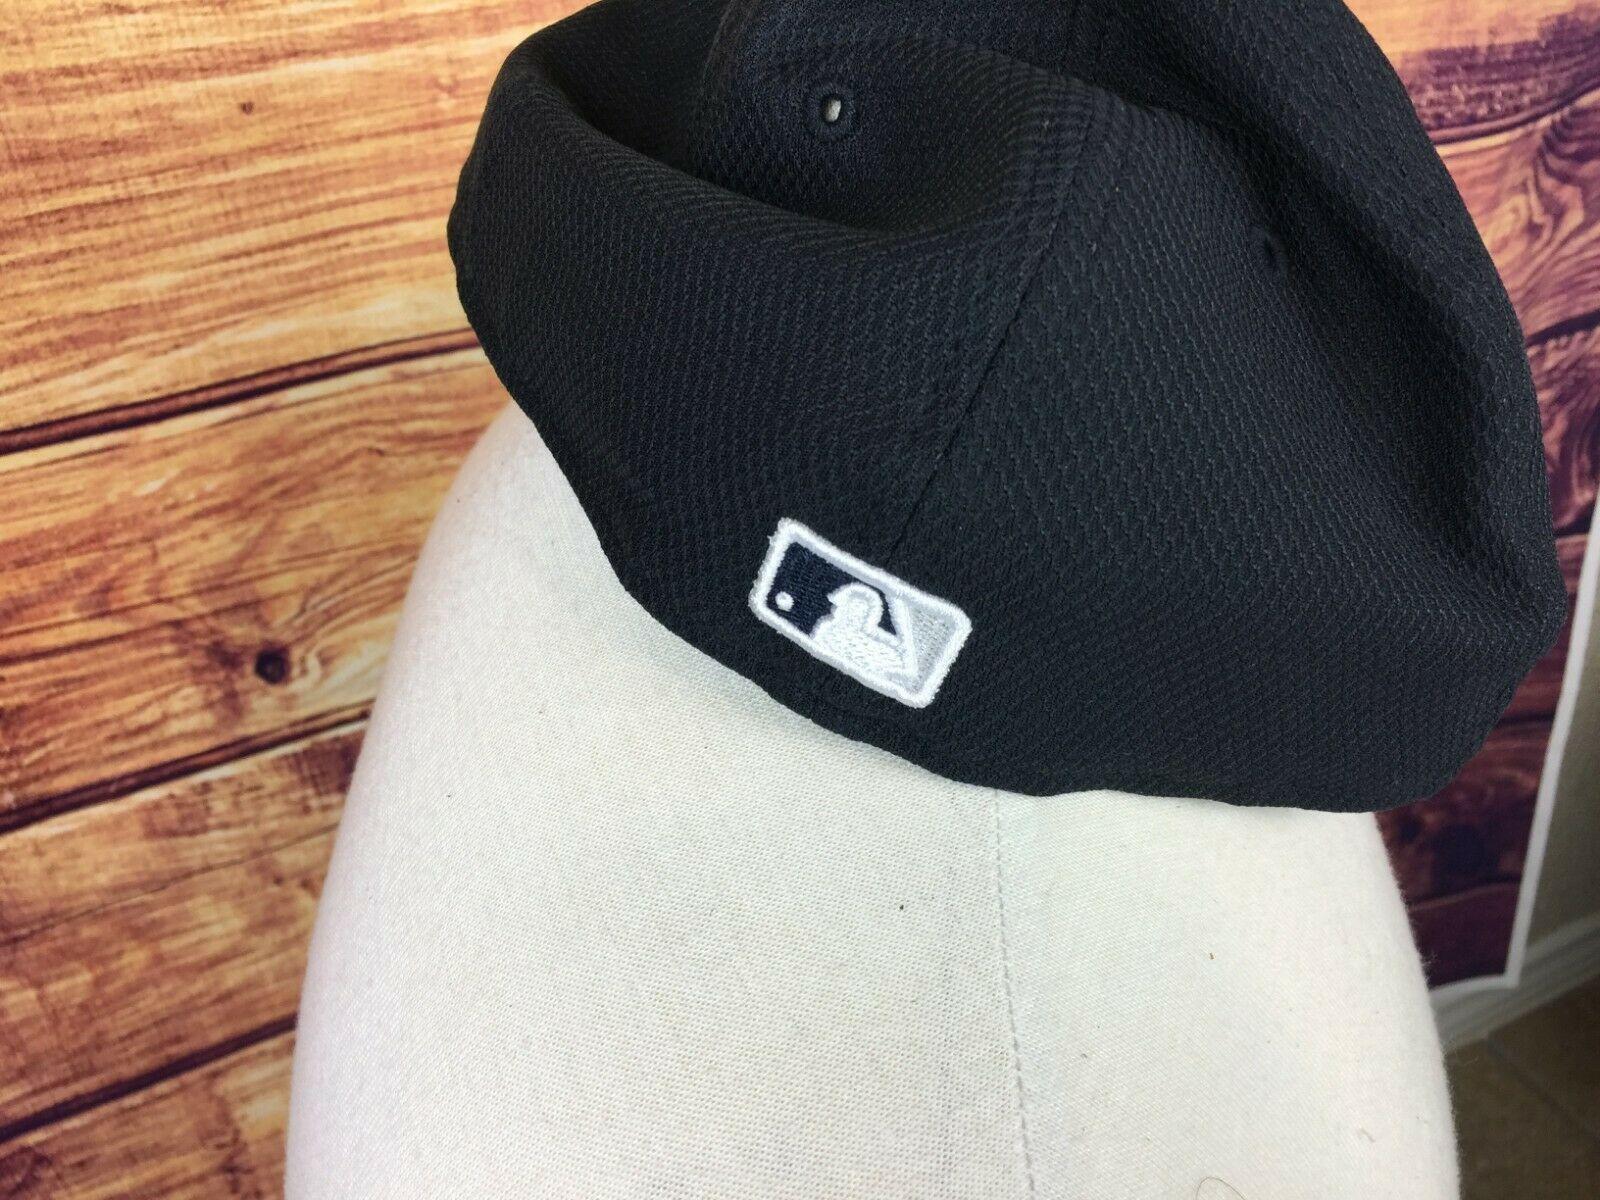 New Era New York Yankees Navy/Gray Road Diamond Era 59FIFTY Fitted Hat 7 5/8